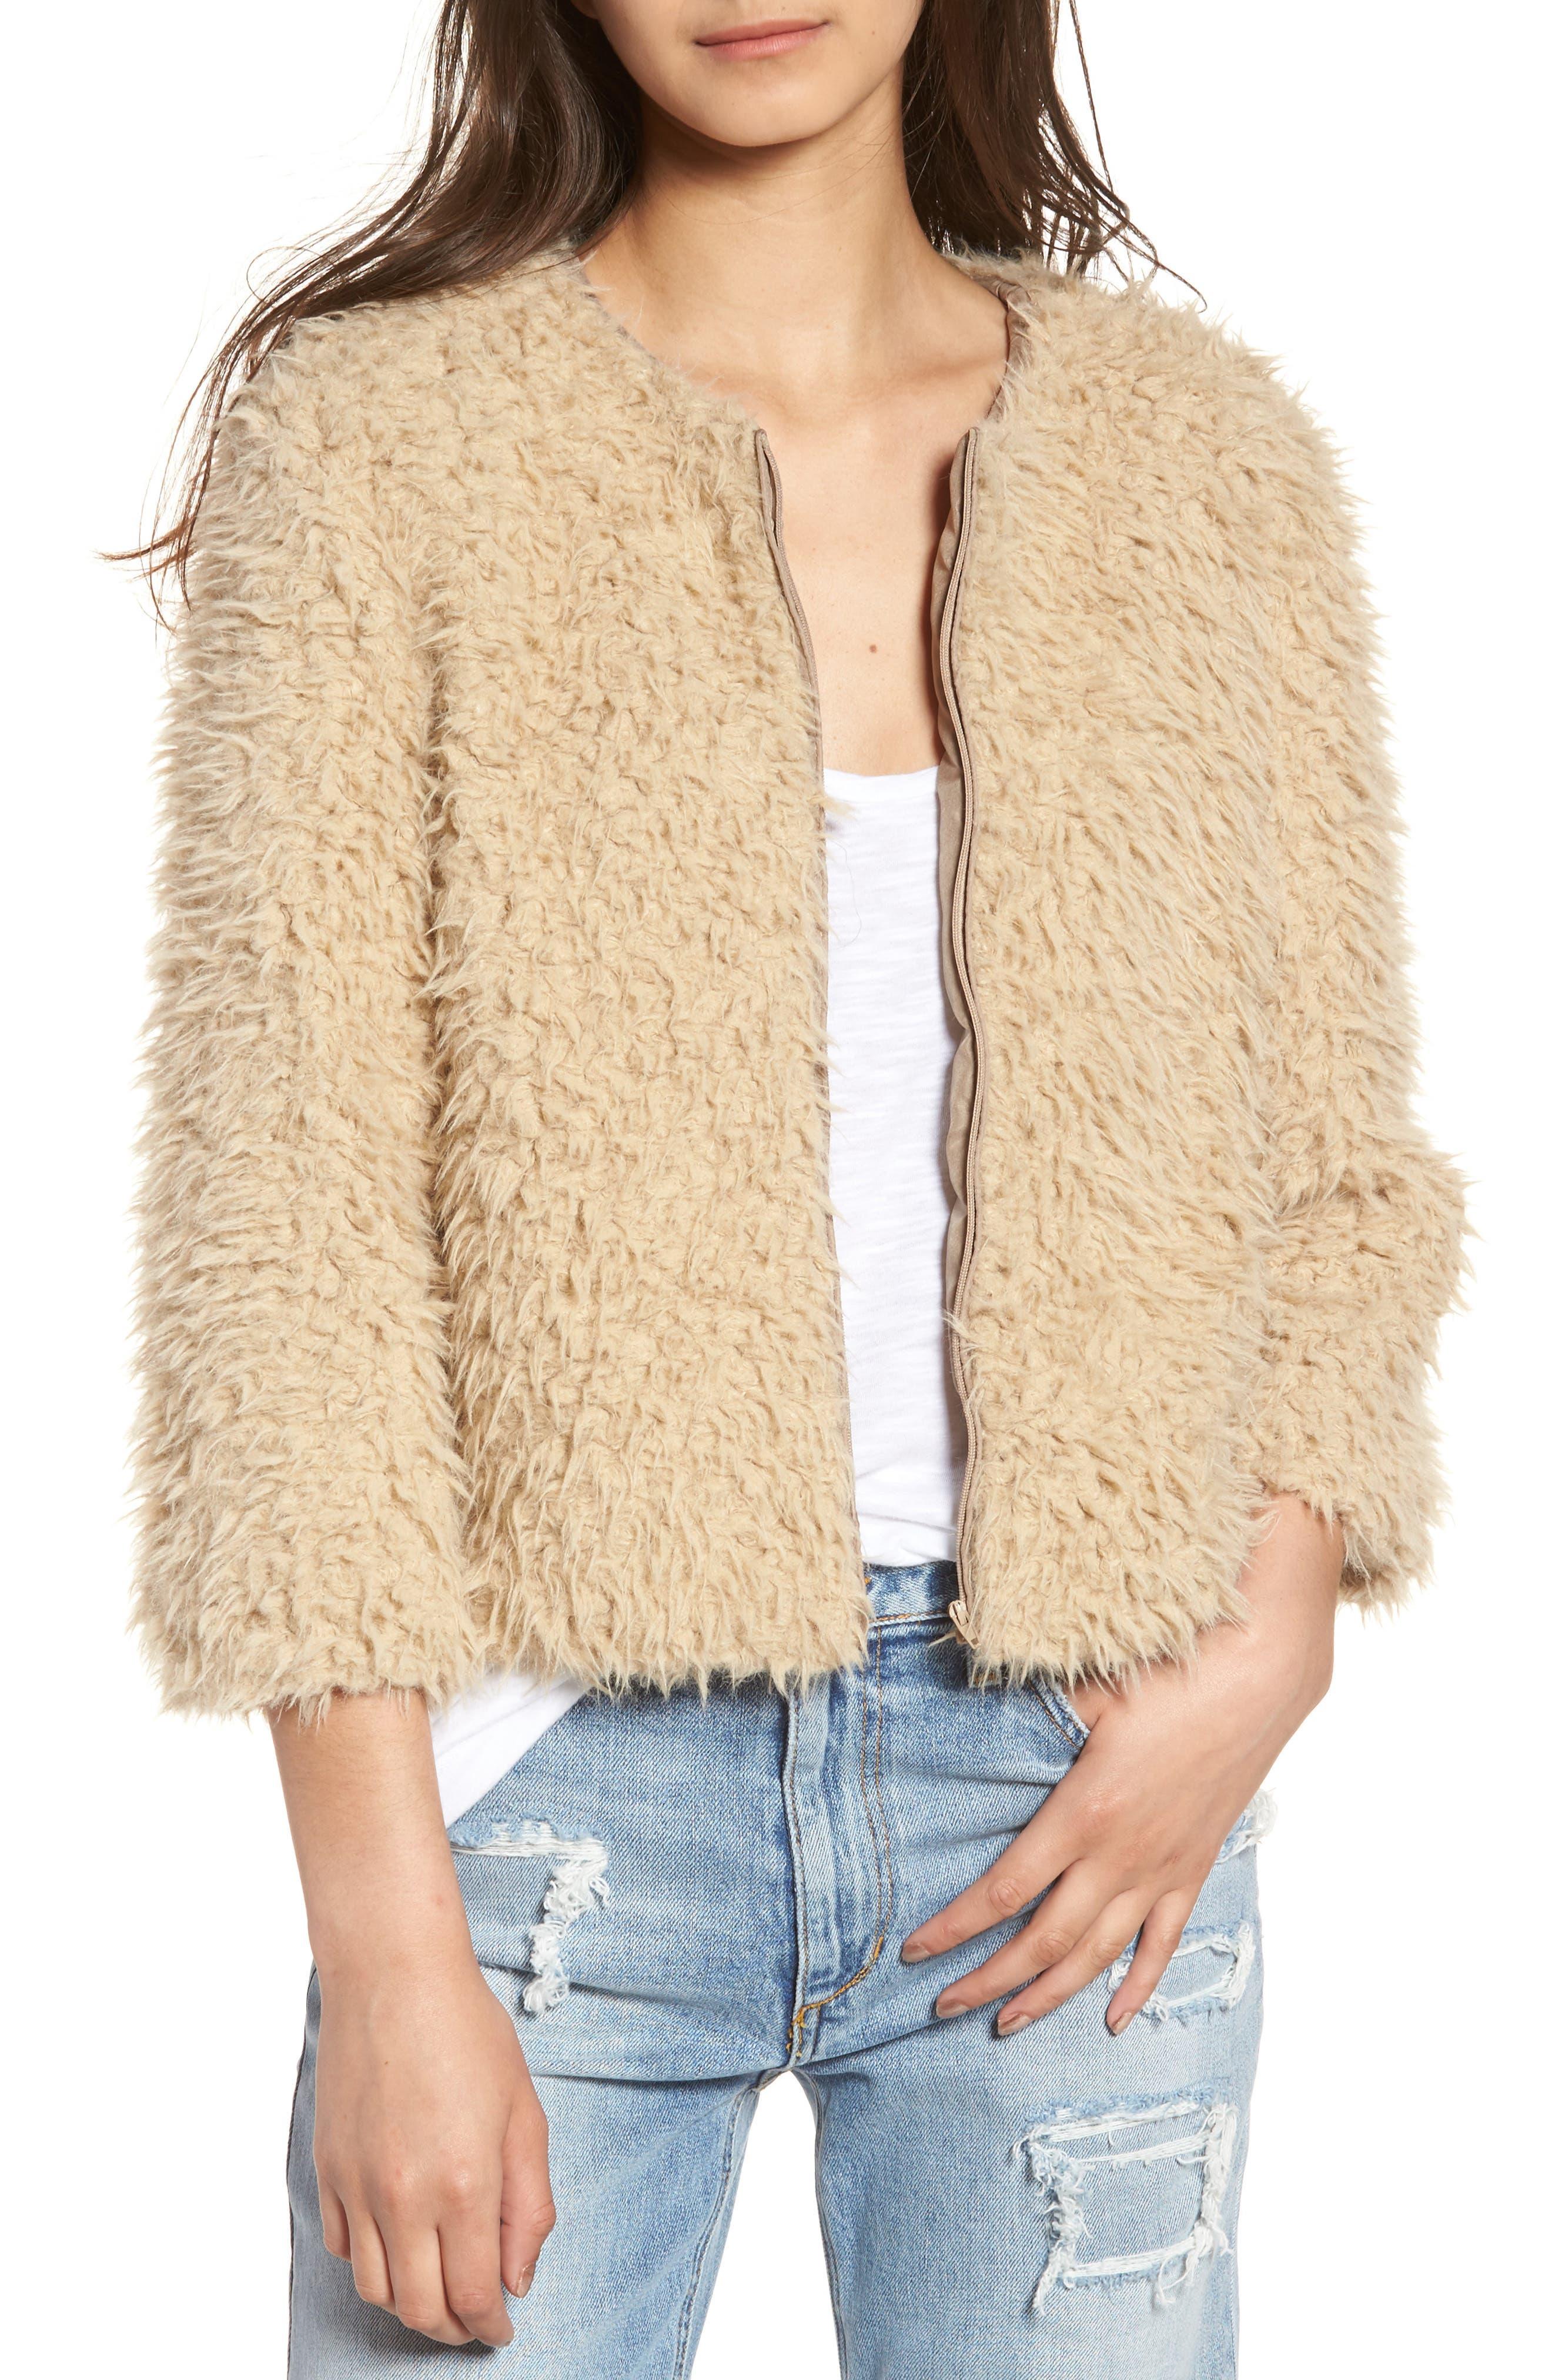 Macy Faux Fur Jacket,                             Main thumbnail 1, color,                             Light Camel